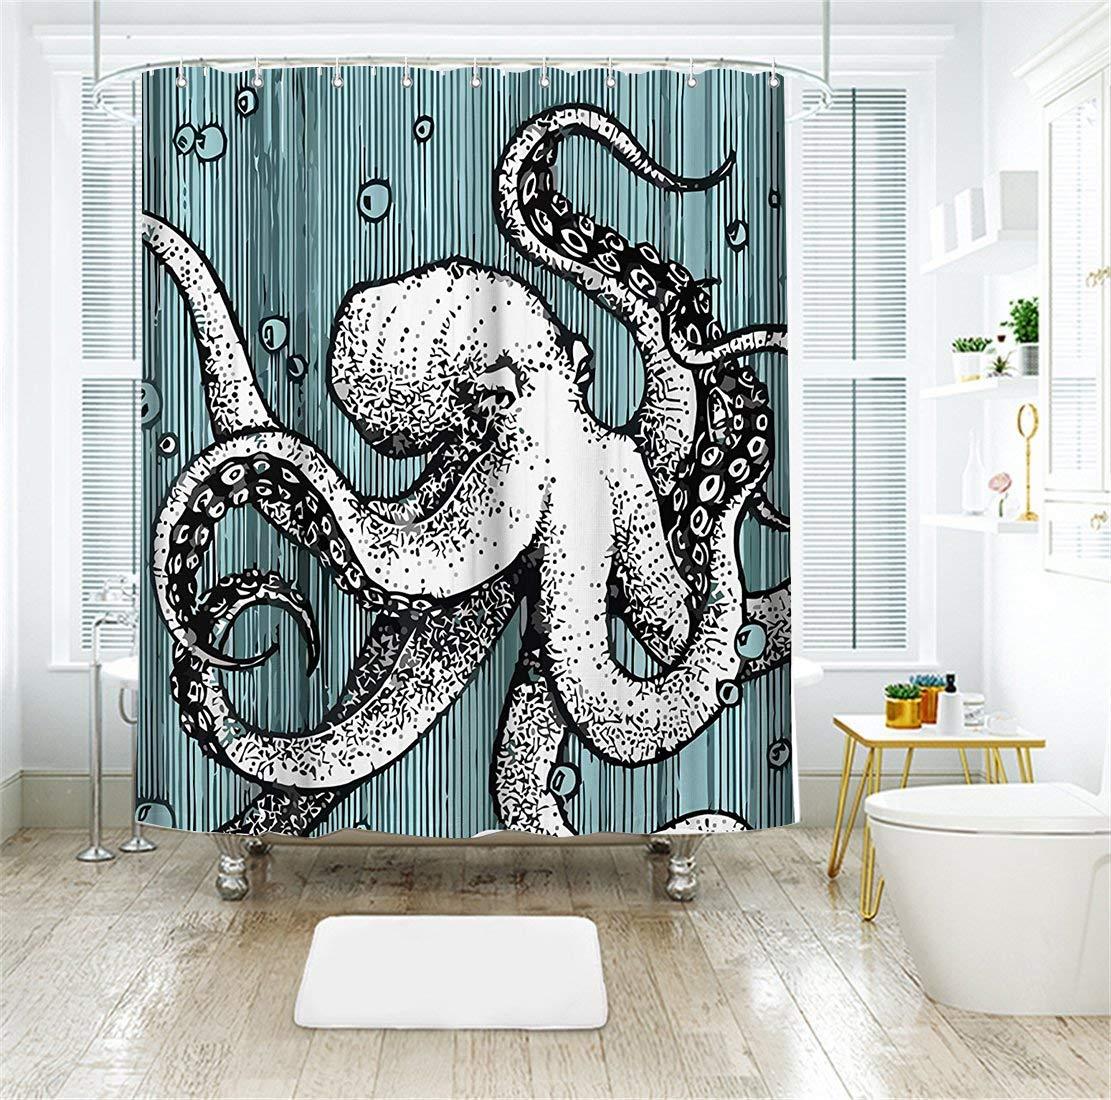 Livilan Octopus Shower Curtain Set 72'' x 72'' Decorative Mildew Resistant Waterproof Polyester Fabric Bathroom Curtain,Blue